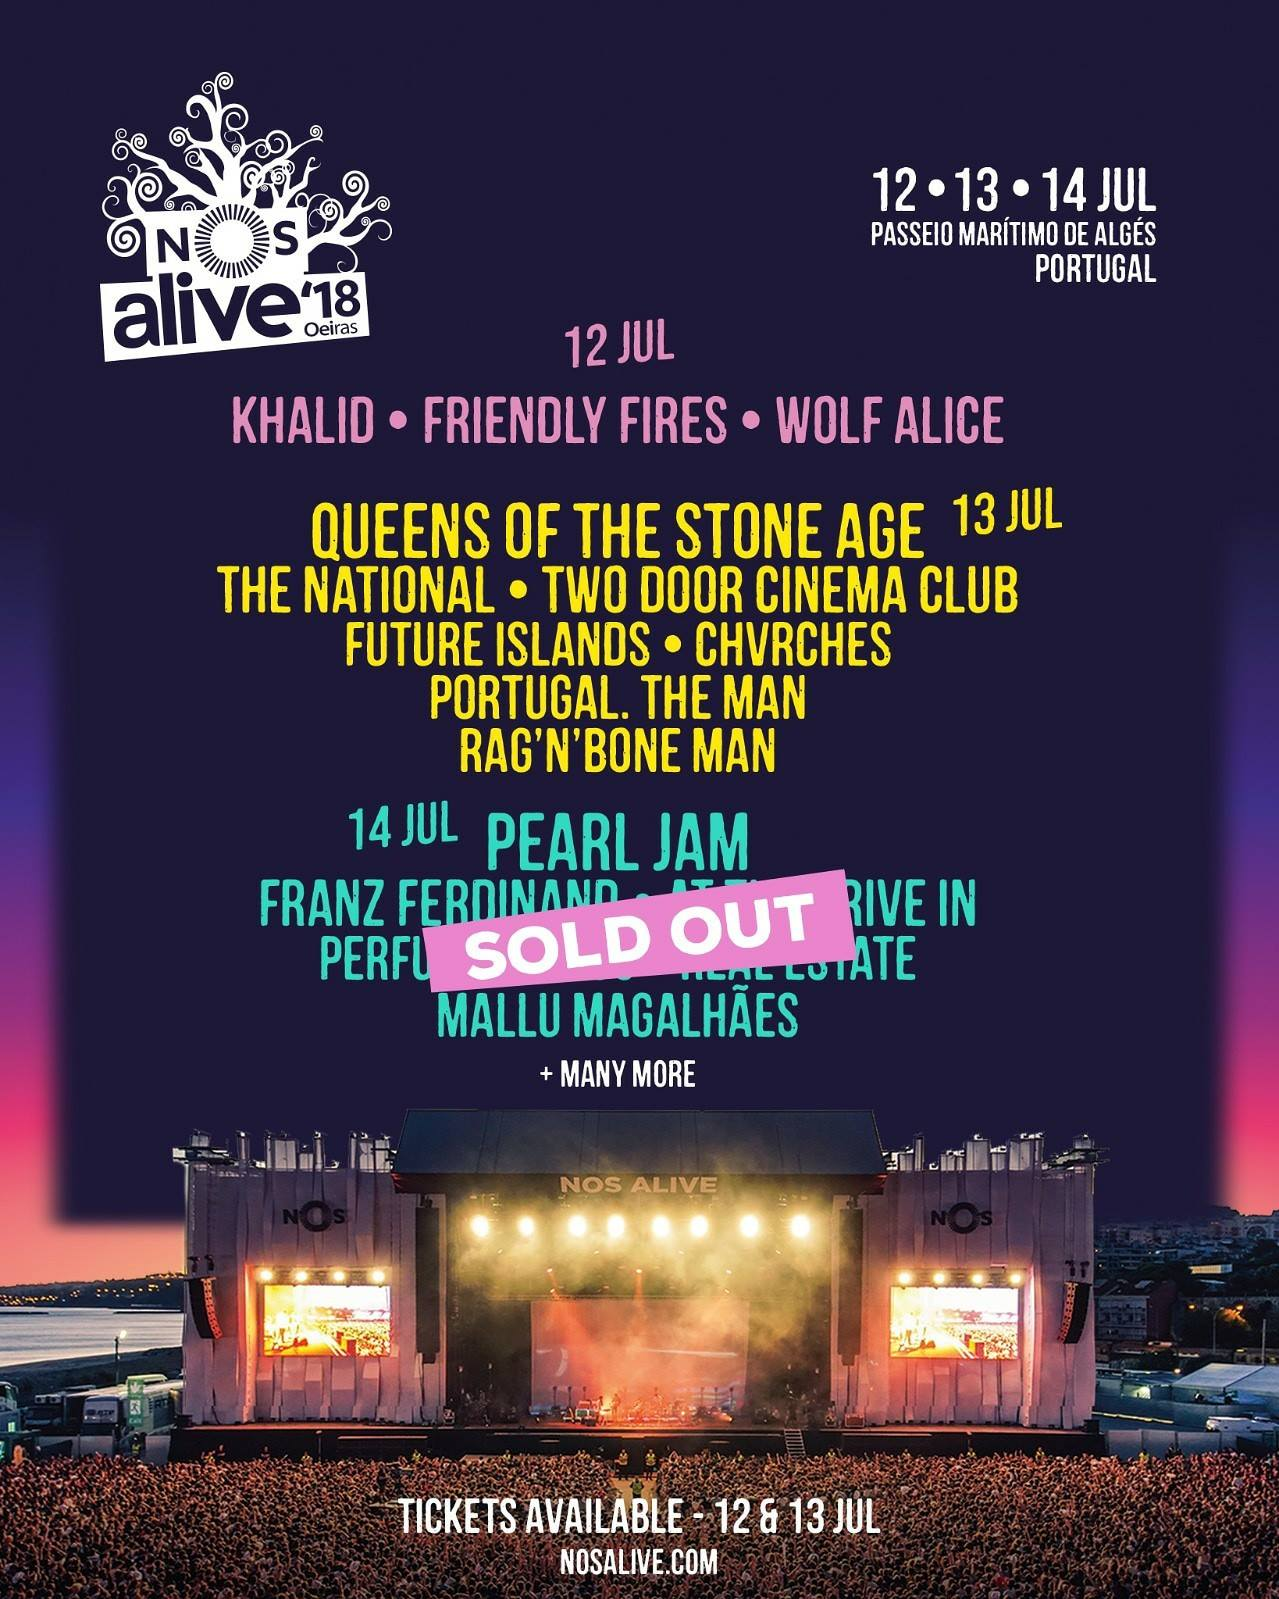 Pearl Jam Tour 2020 >> NOS Alive Festival 2018 - 12/07/2018 (3 days) - Lisboa